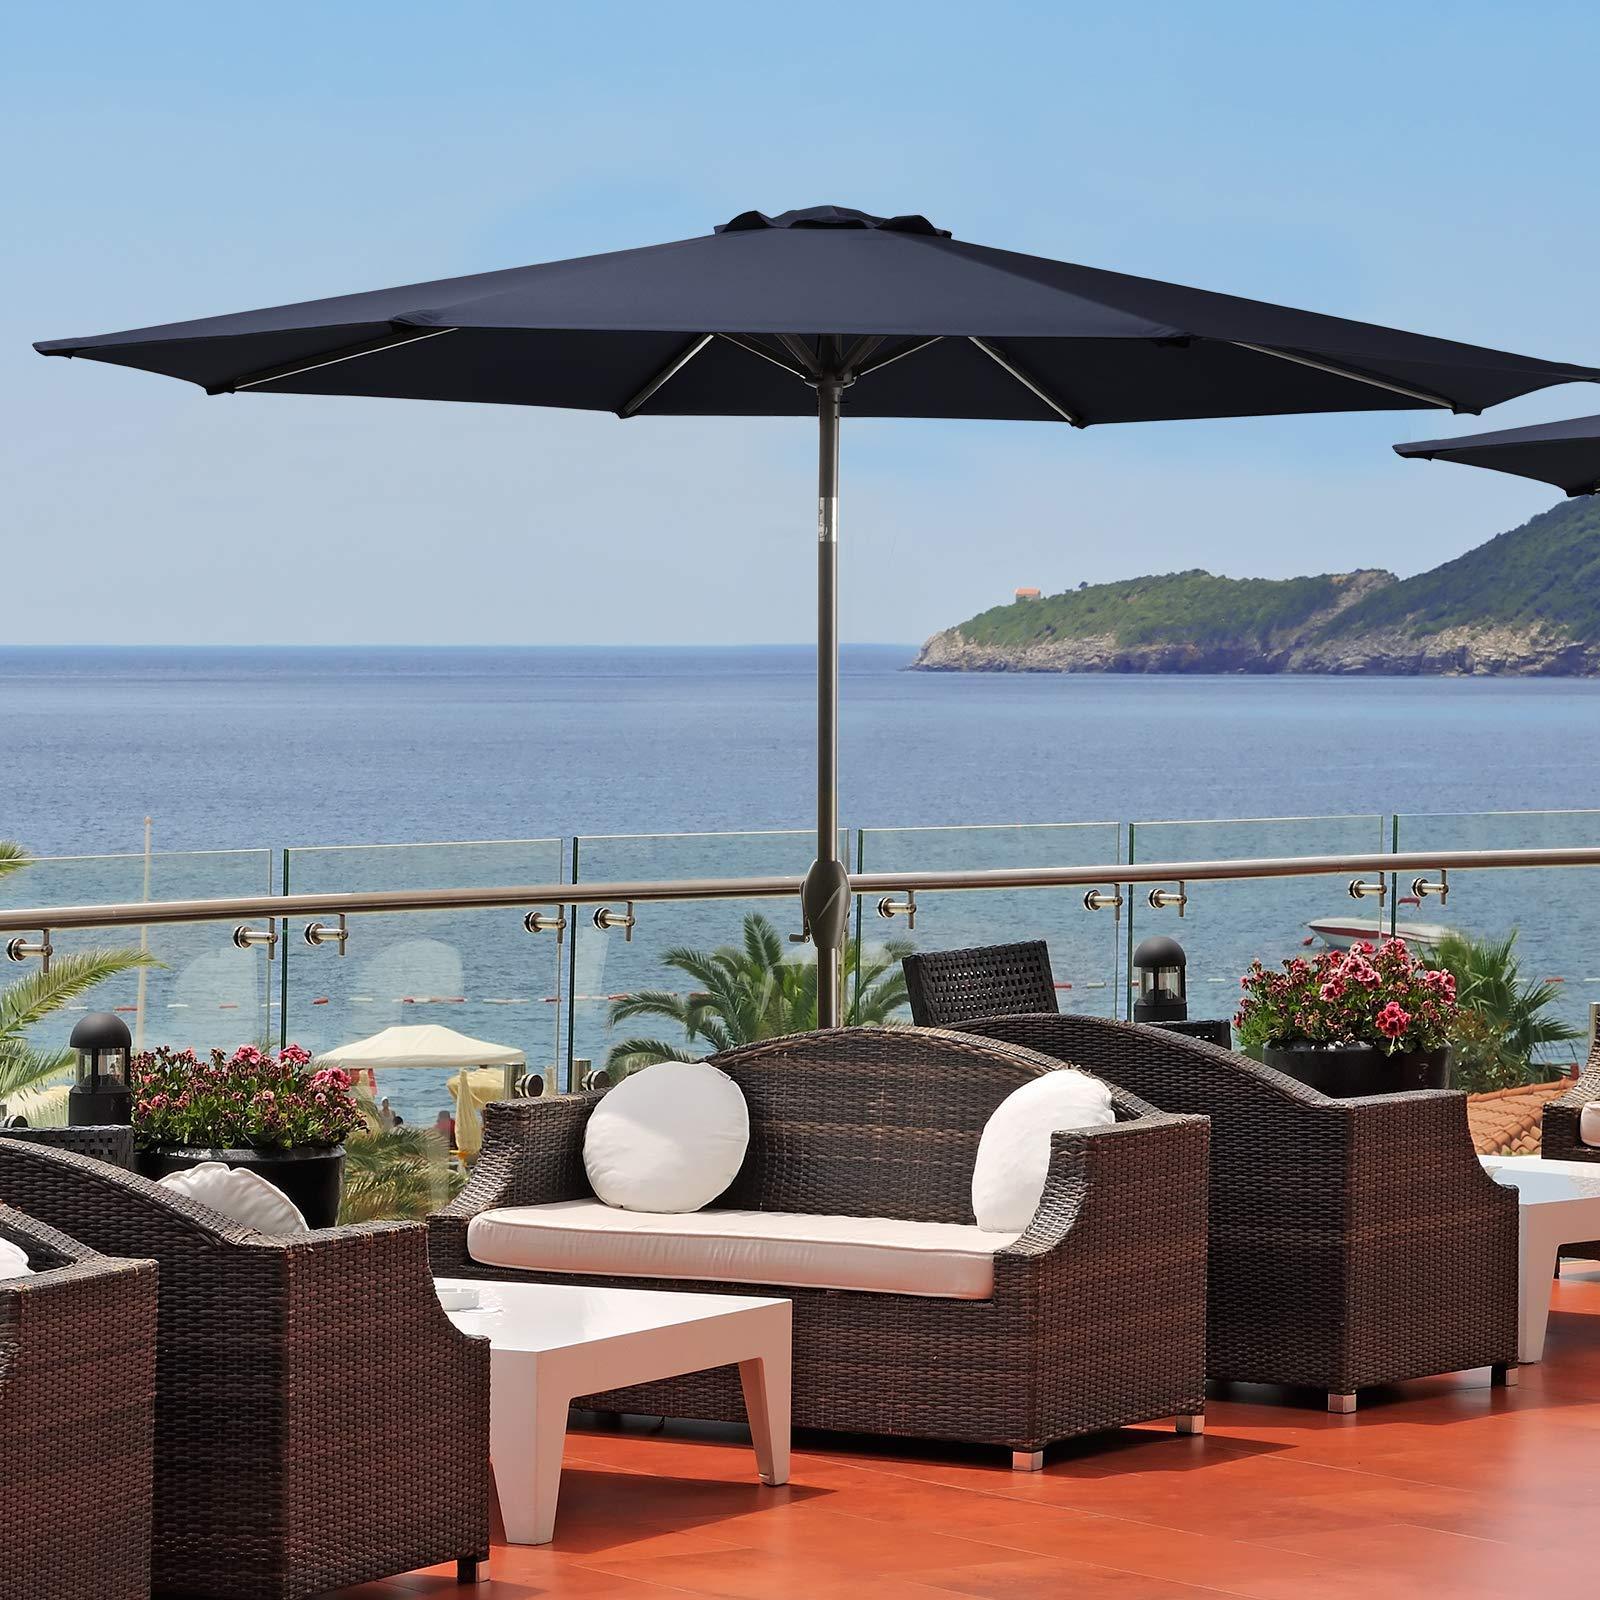 Bumblr 9ft Patio Umbrella Outdoor Market Table Umbrella with Push Button Tilt/Crank & 8 Sturdy Ribs Sun Umbrella for Garden Lawn Deck Backyard Pool, Navy New2